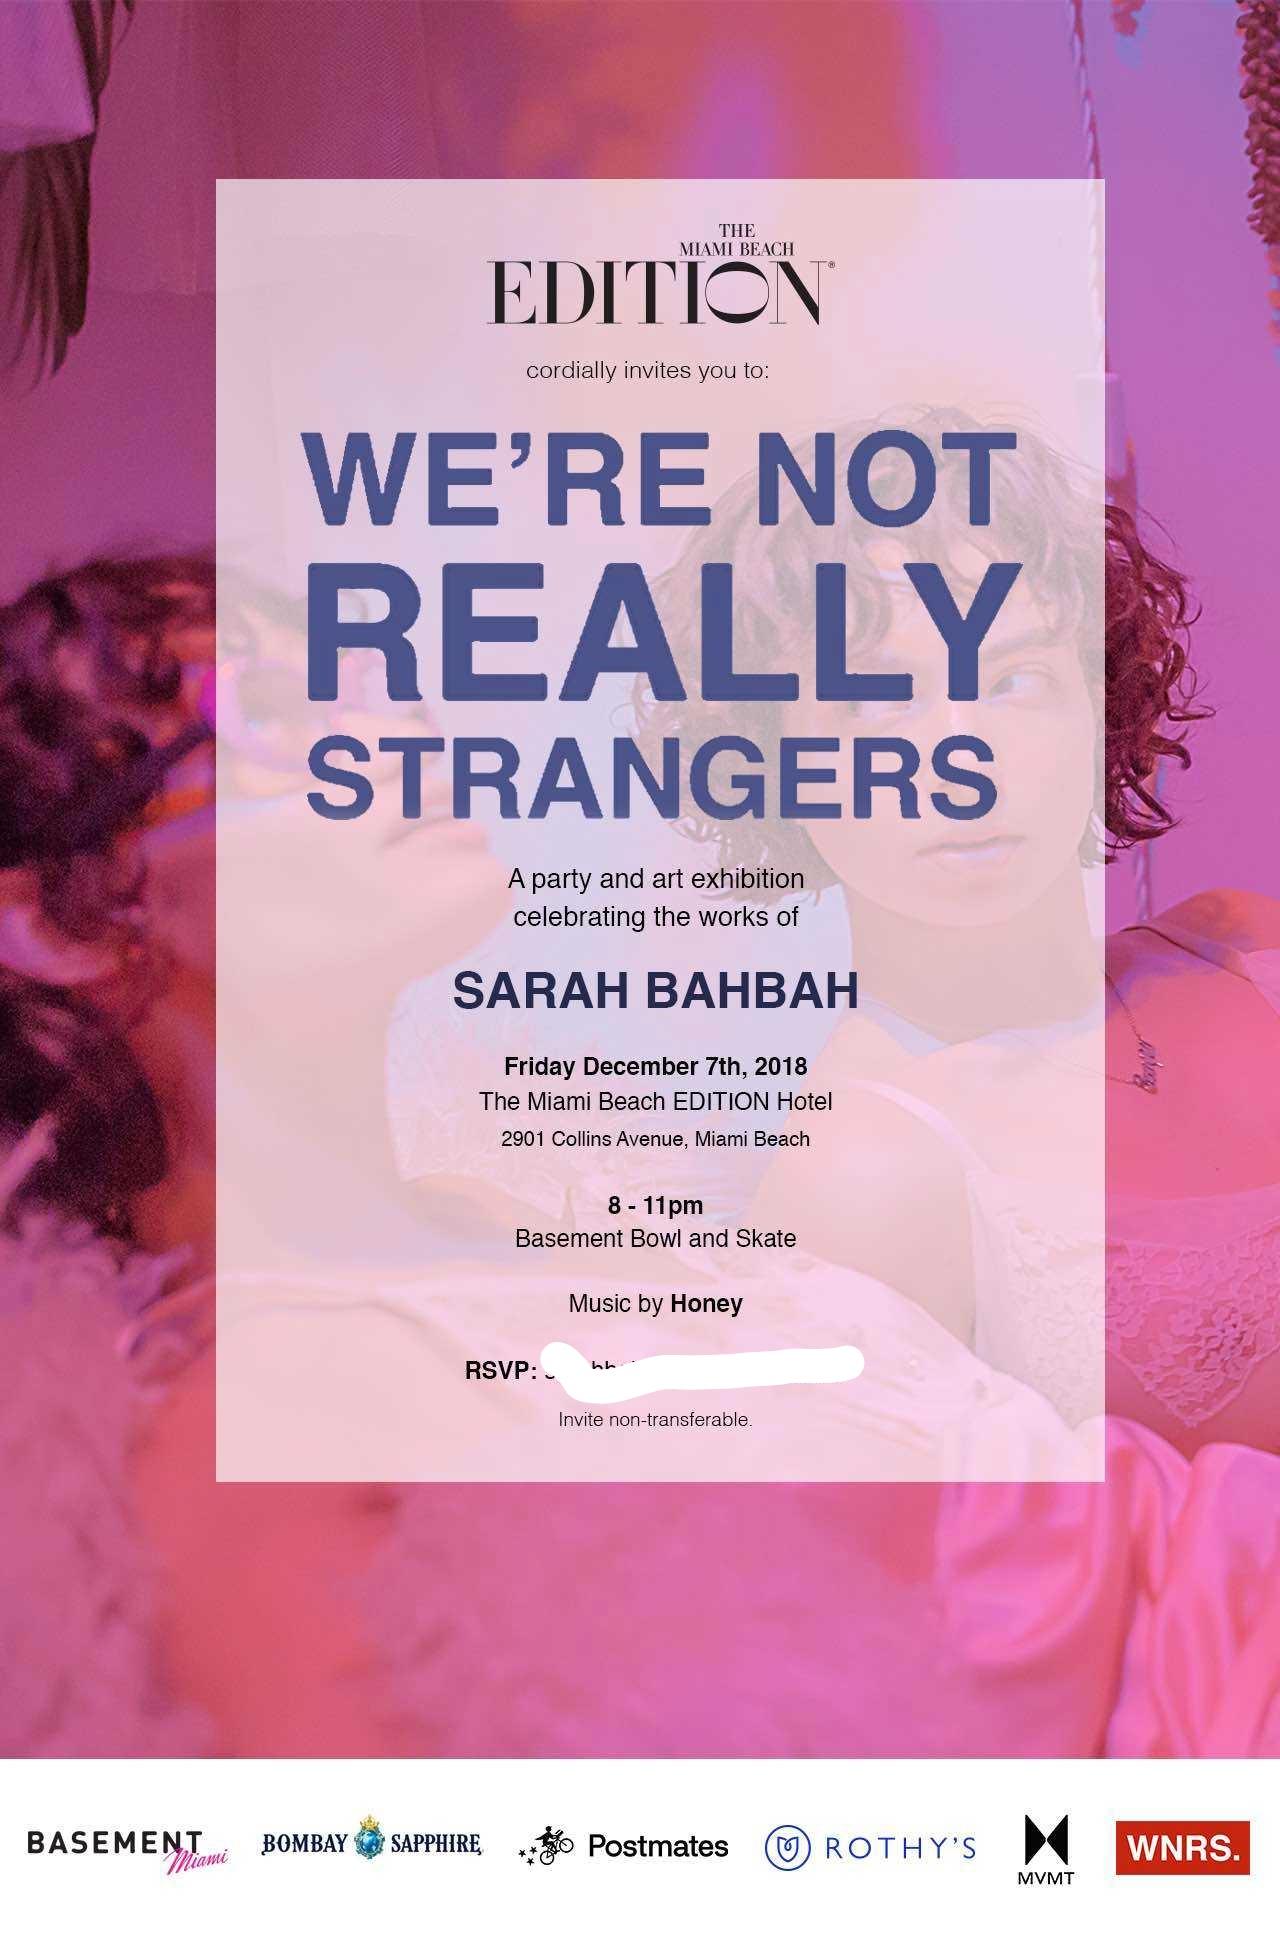 were not really strangers sarah bahbah the edition hotel miami art basel 2018_LI.jpg